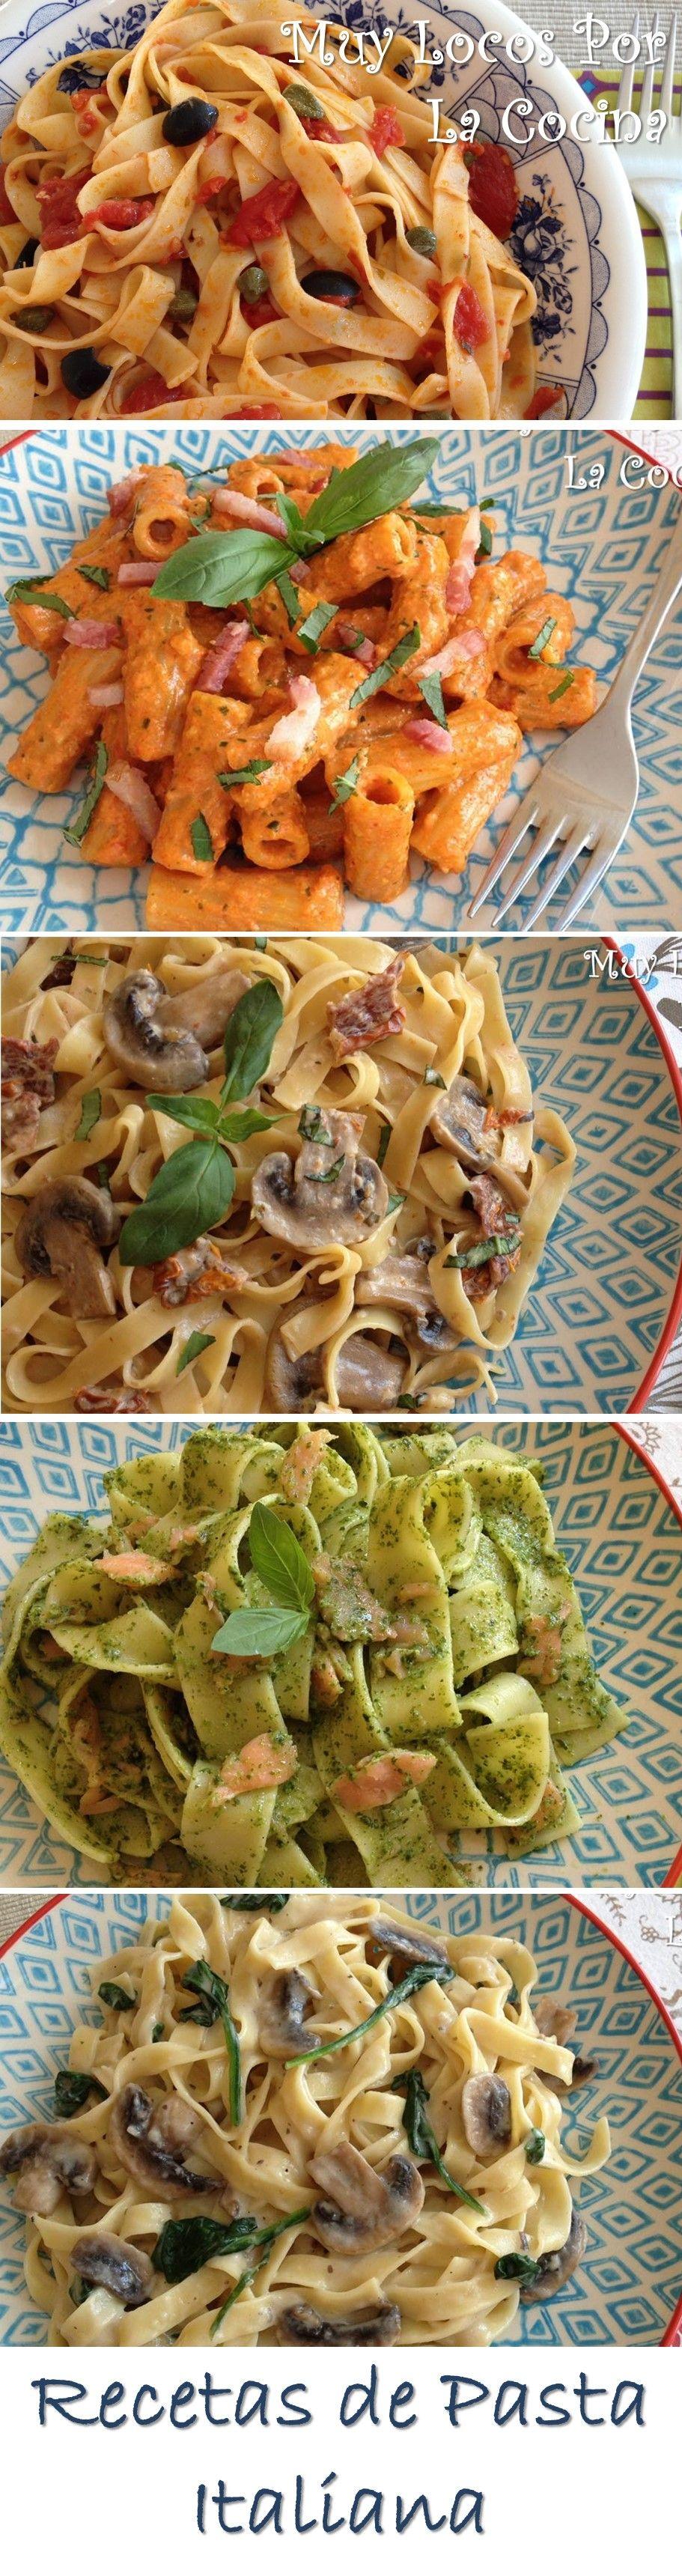 Pasta Italiana Recetas De Pasta Italiana Recetas De